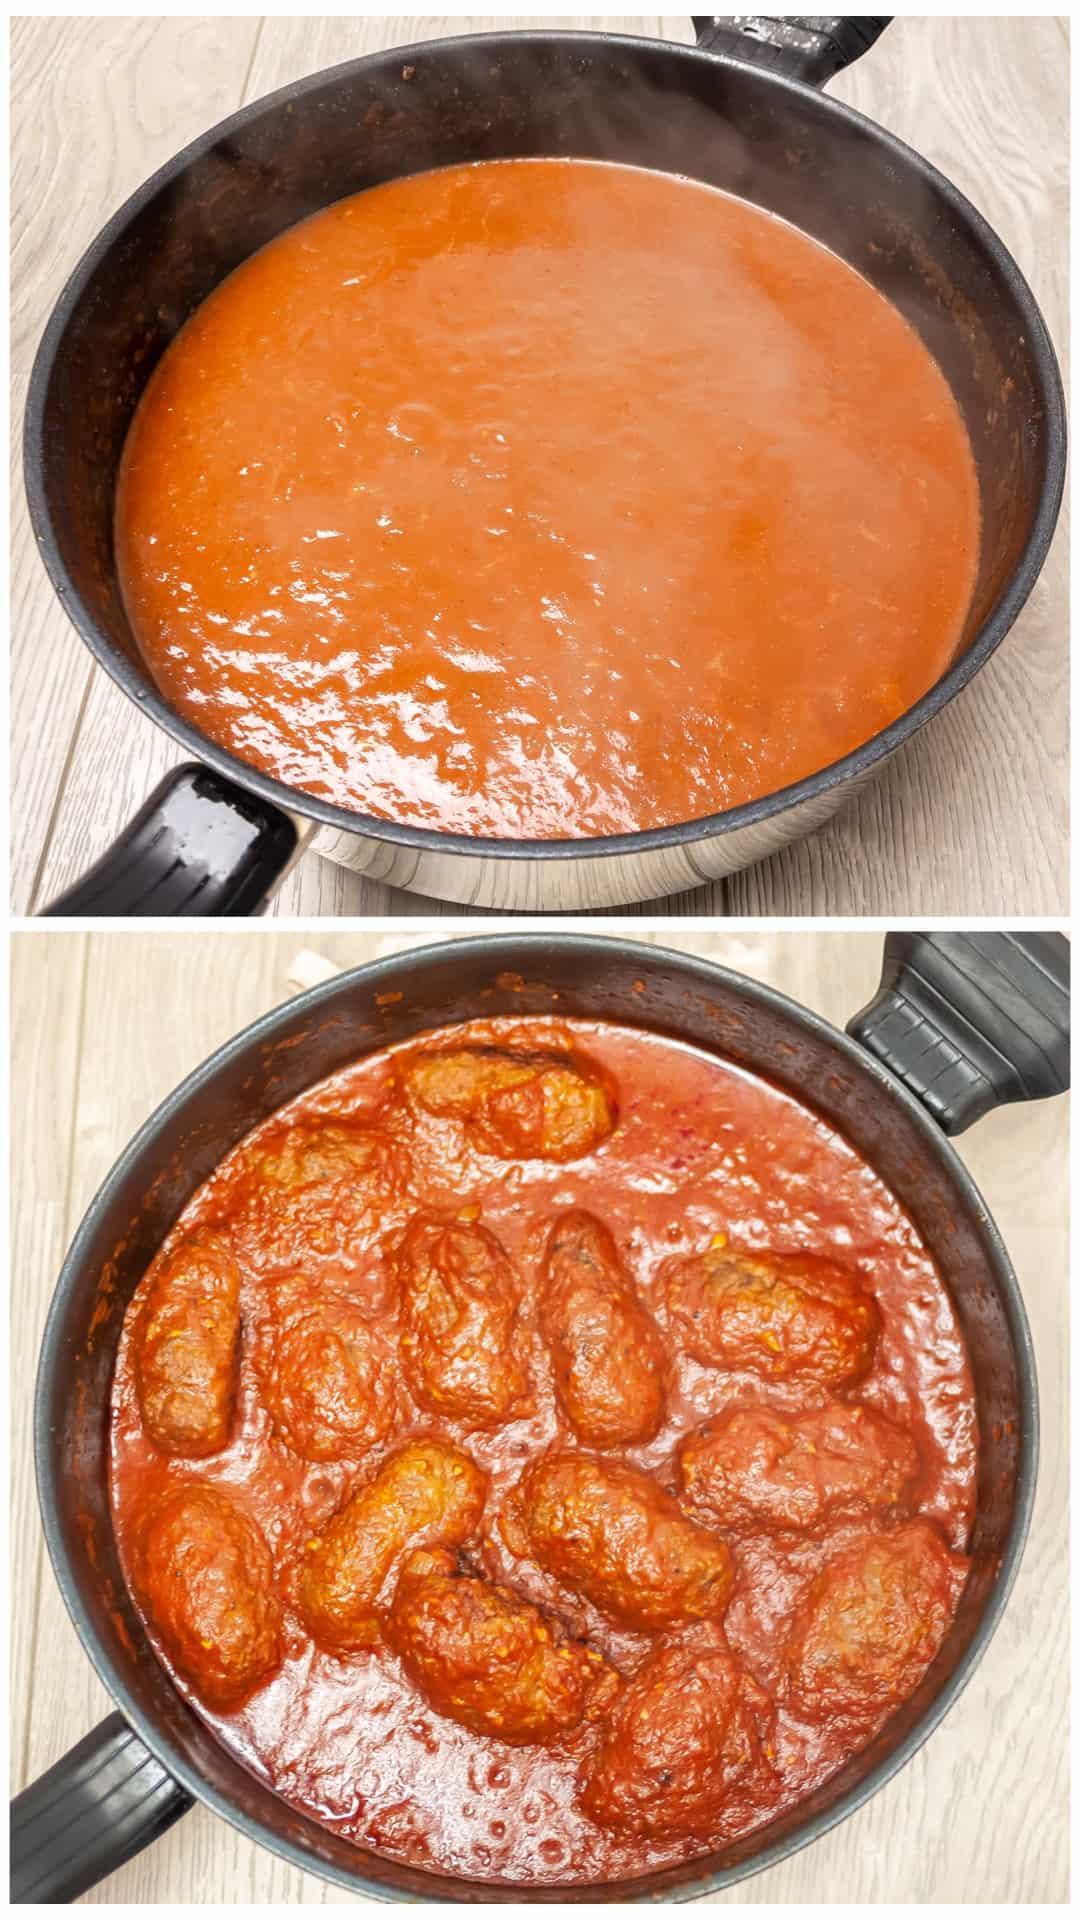 Traditional Soutzoukakia recipe (Greek baked Meatballs in tomato sauce) - preparing the sauce